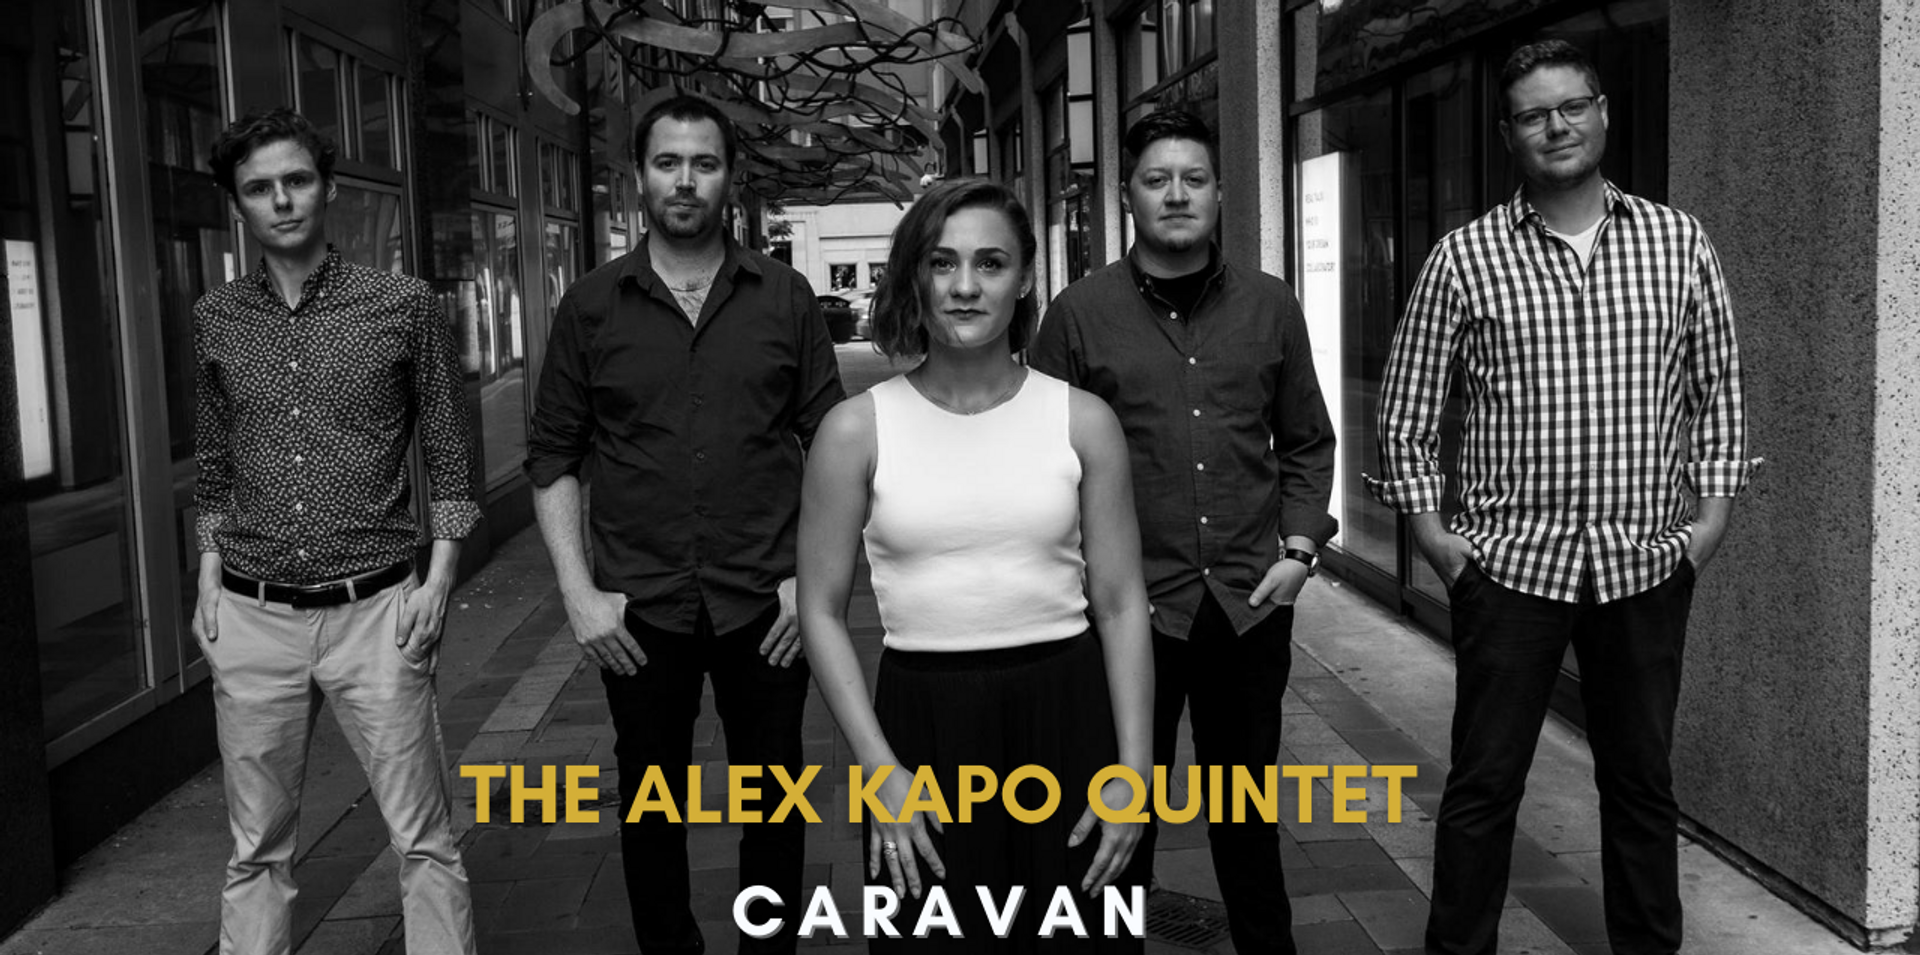 Alex Kapo Quintet at the Rex